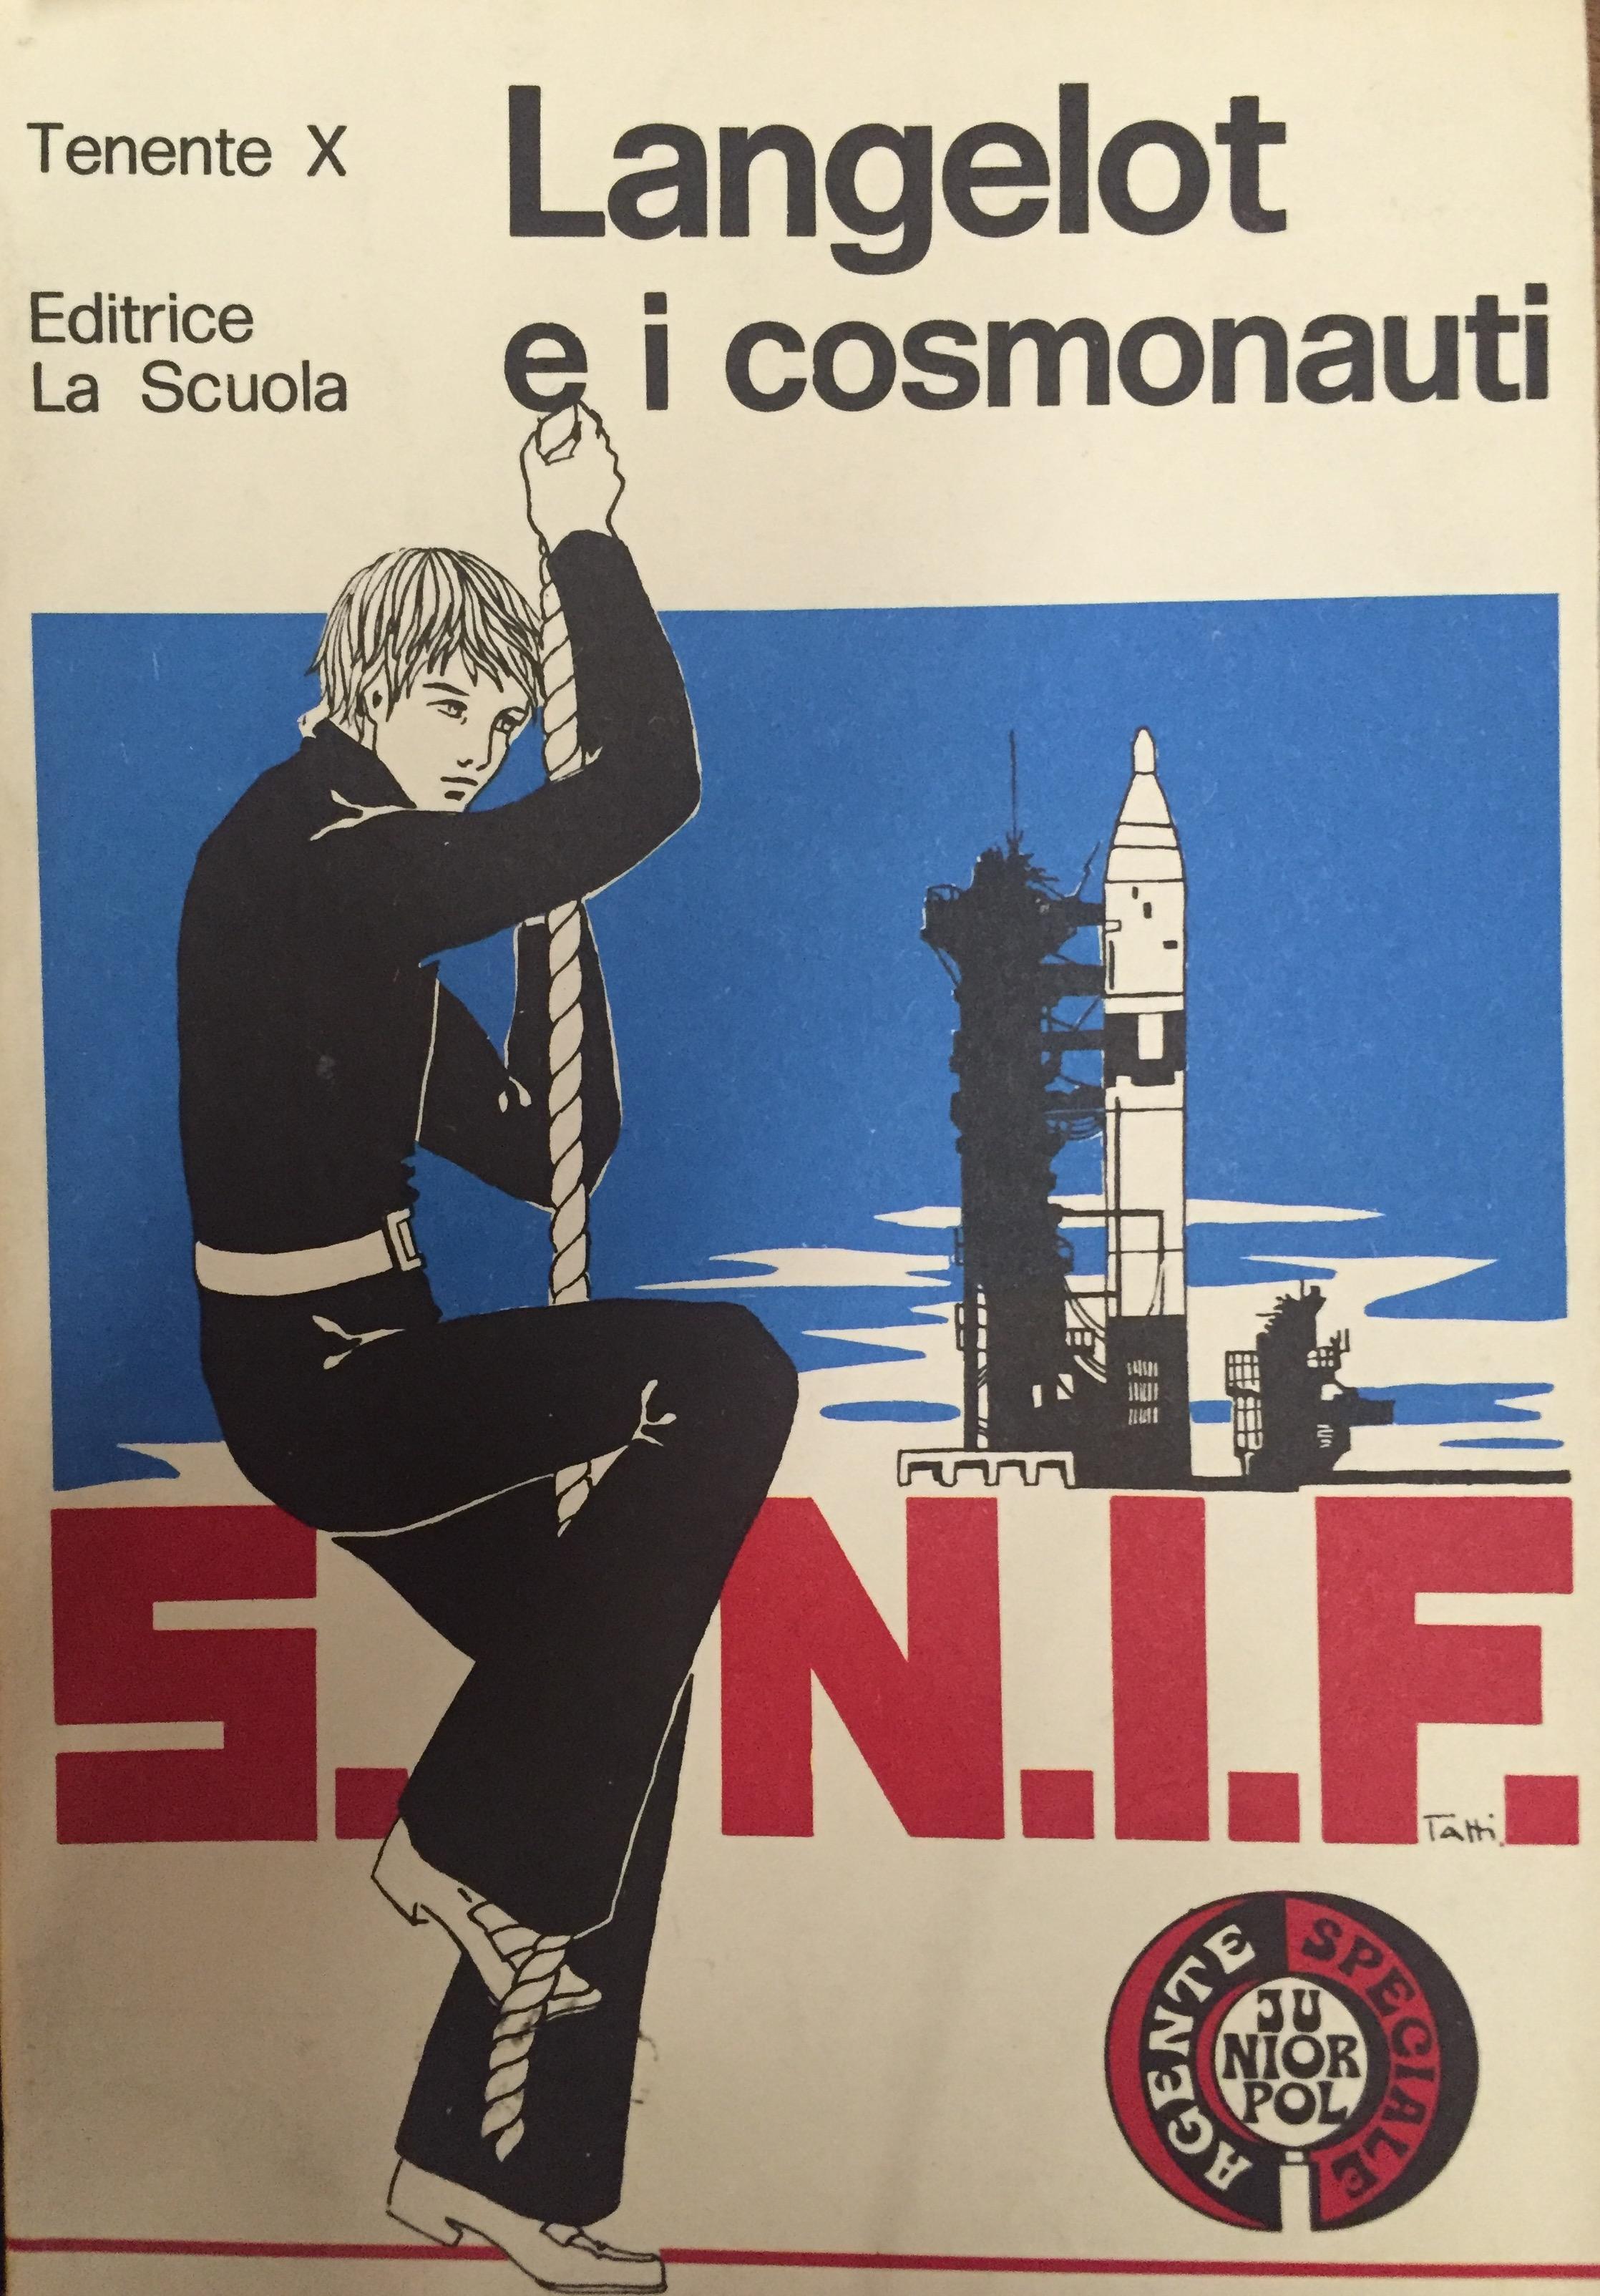 Langelot e i cosmonauti